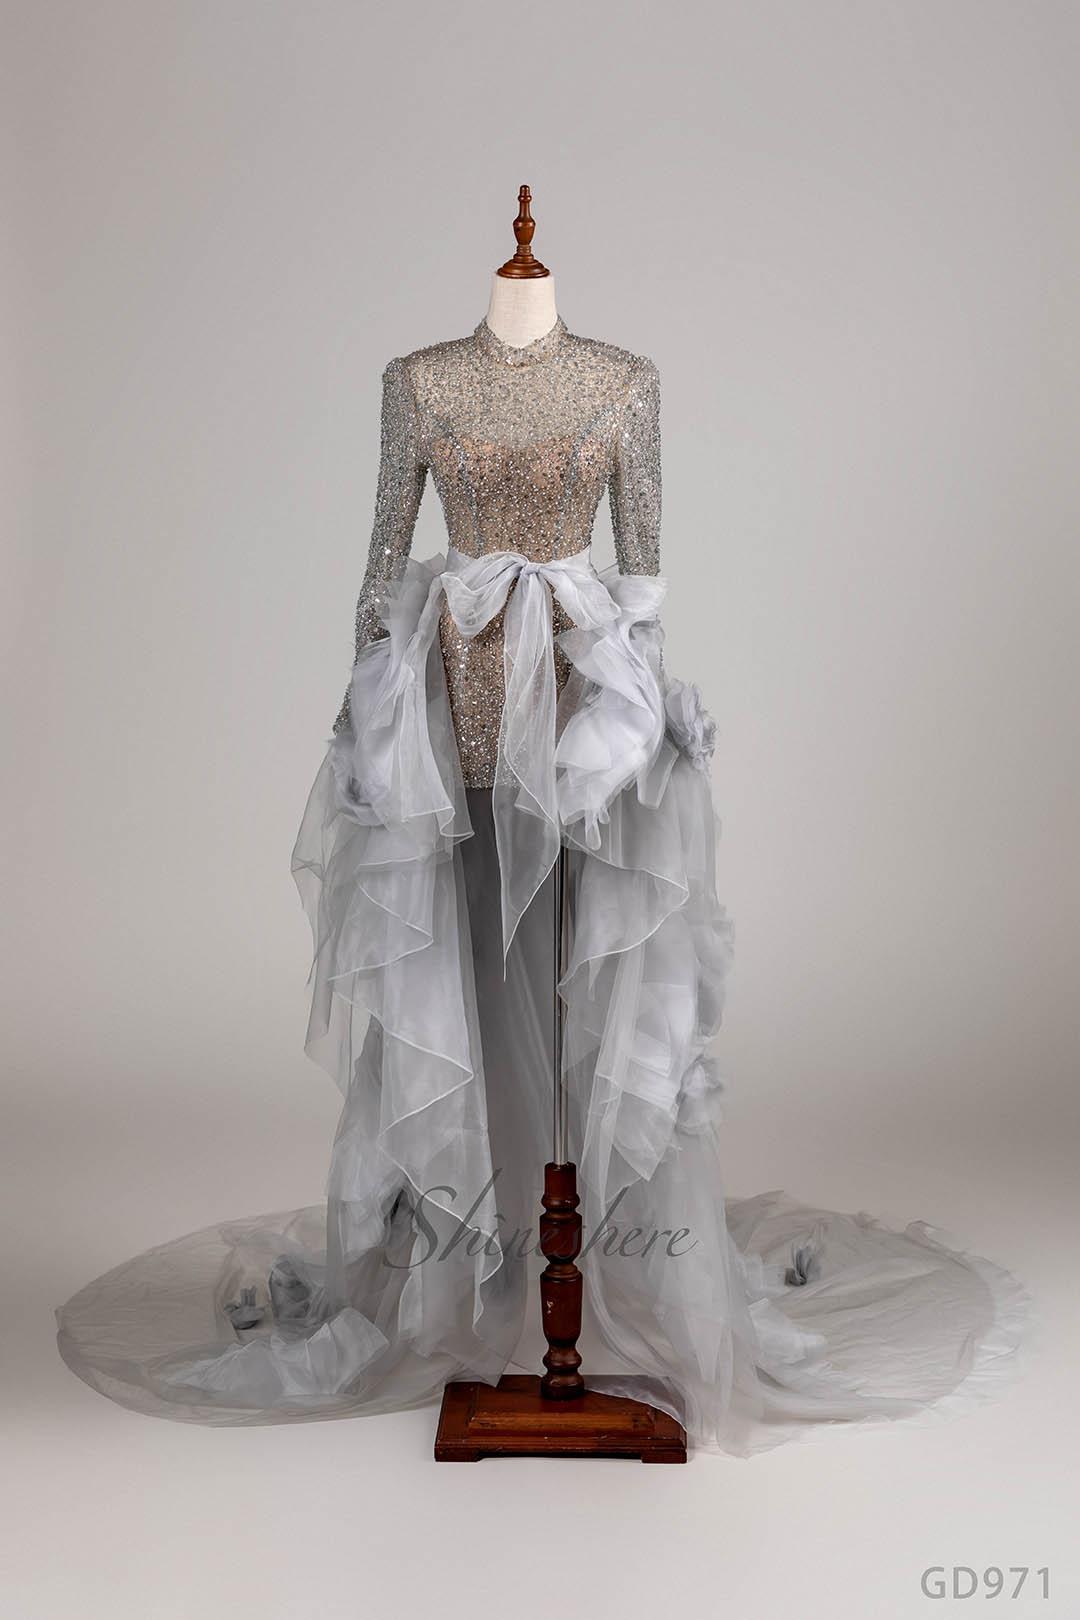 Jusere فستان الزفاف فستان قصير مع سويب تراين كم طويل بدون ظهر دانتيل رقبة عالية خرز فستان زفاف